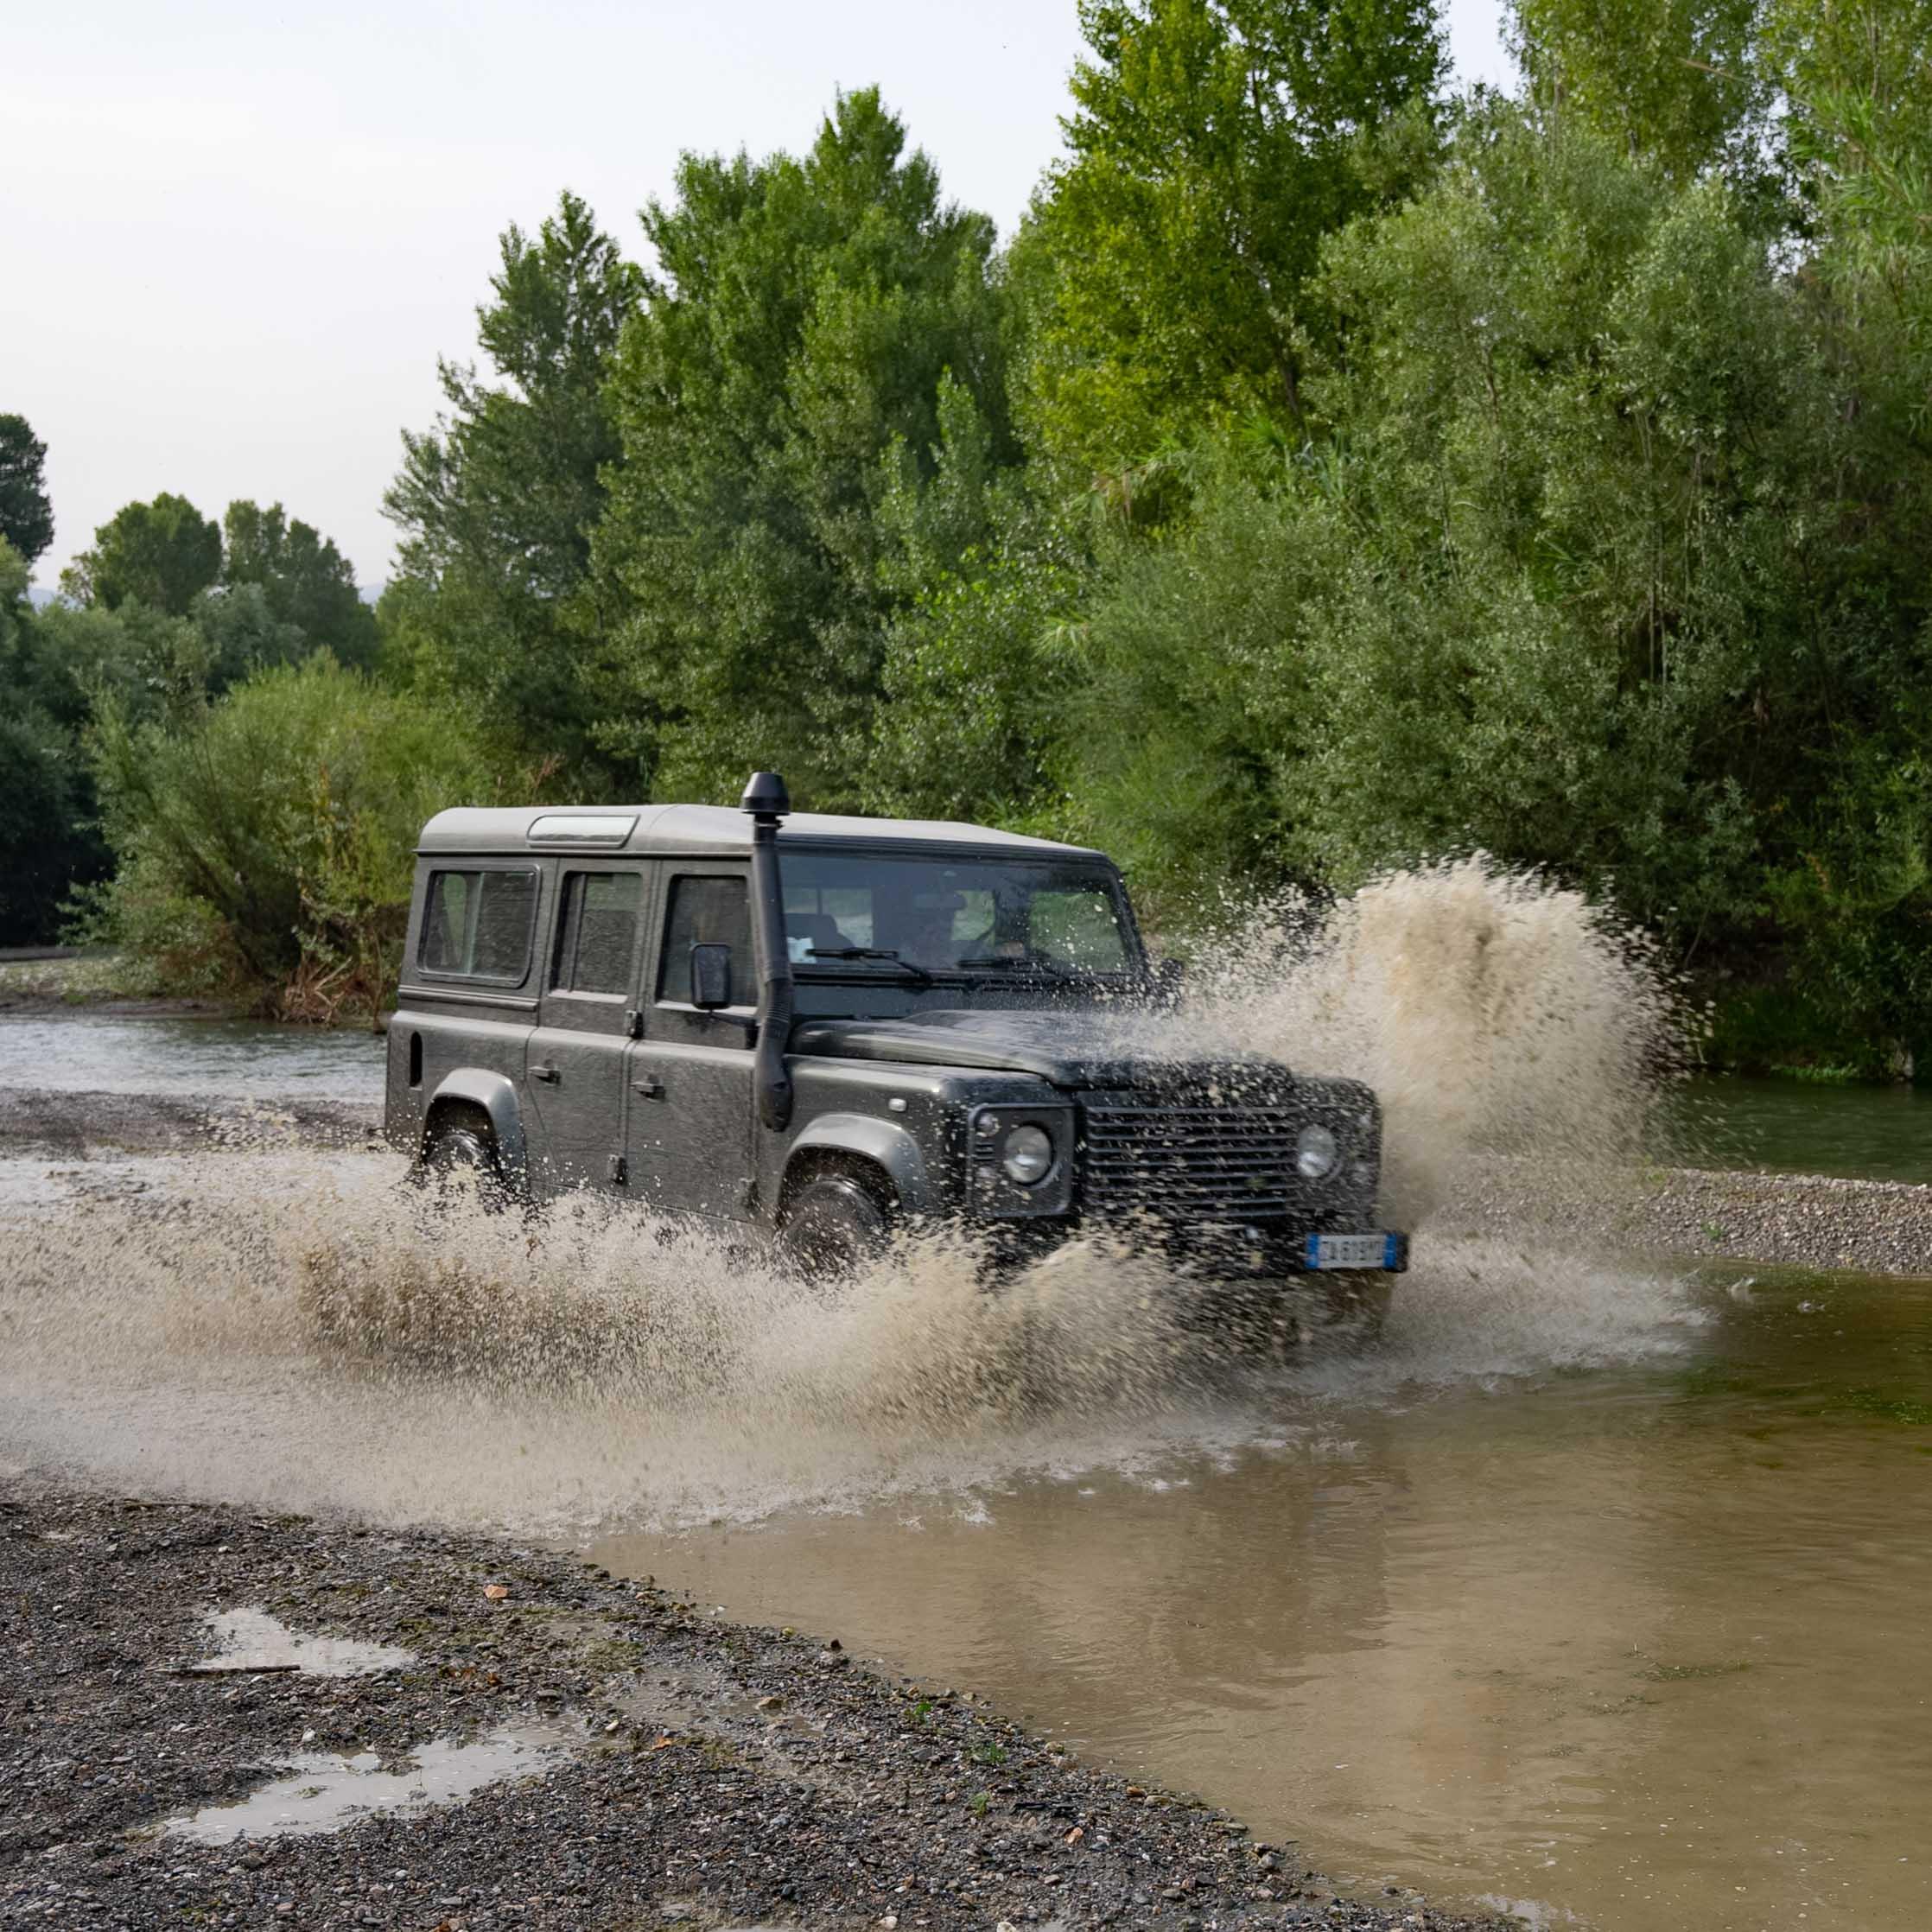 Land_Rover_Tour_Sicilia_2021_Land_Rover_Experience_Italia_-37